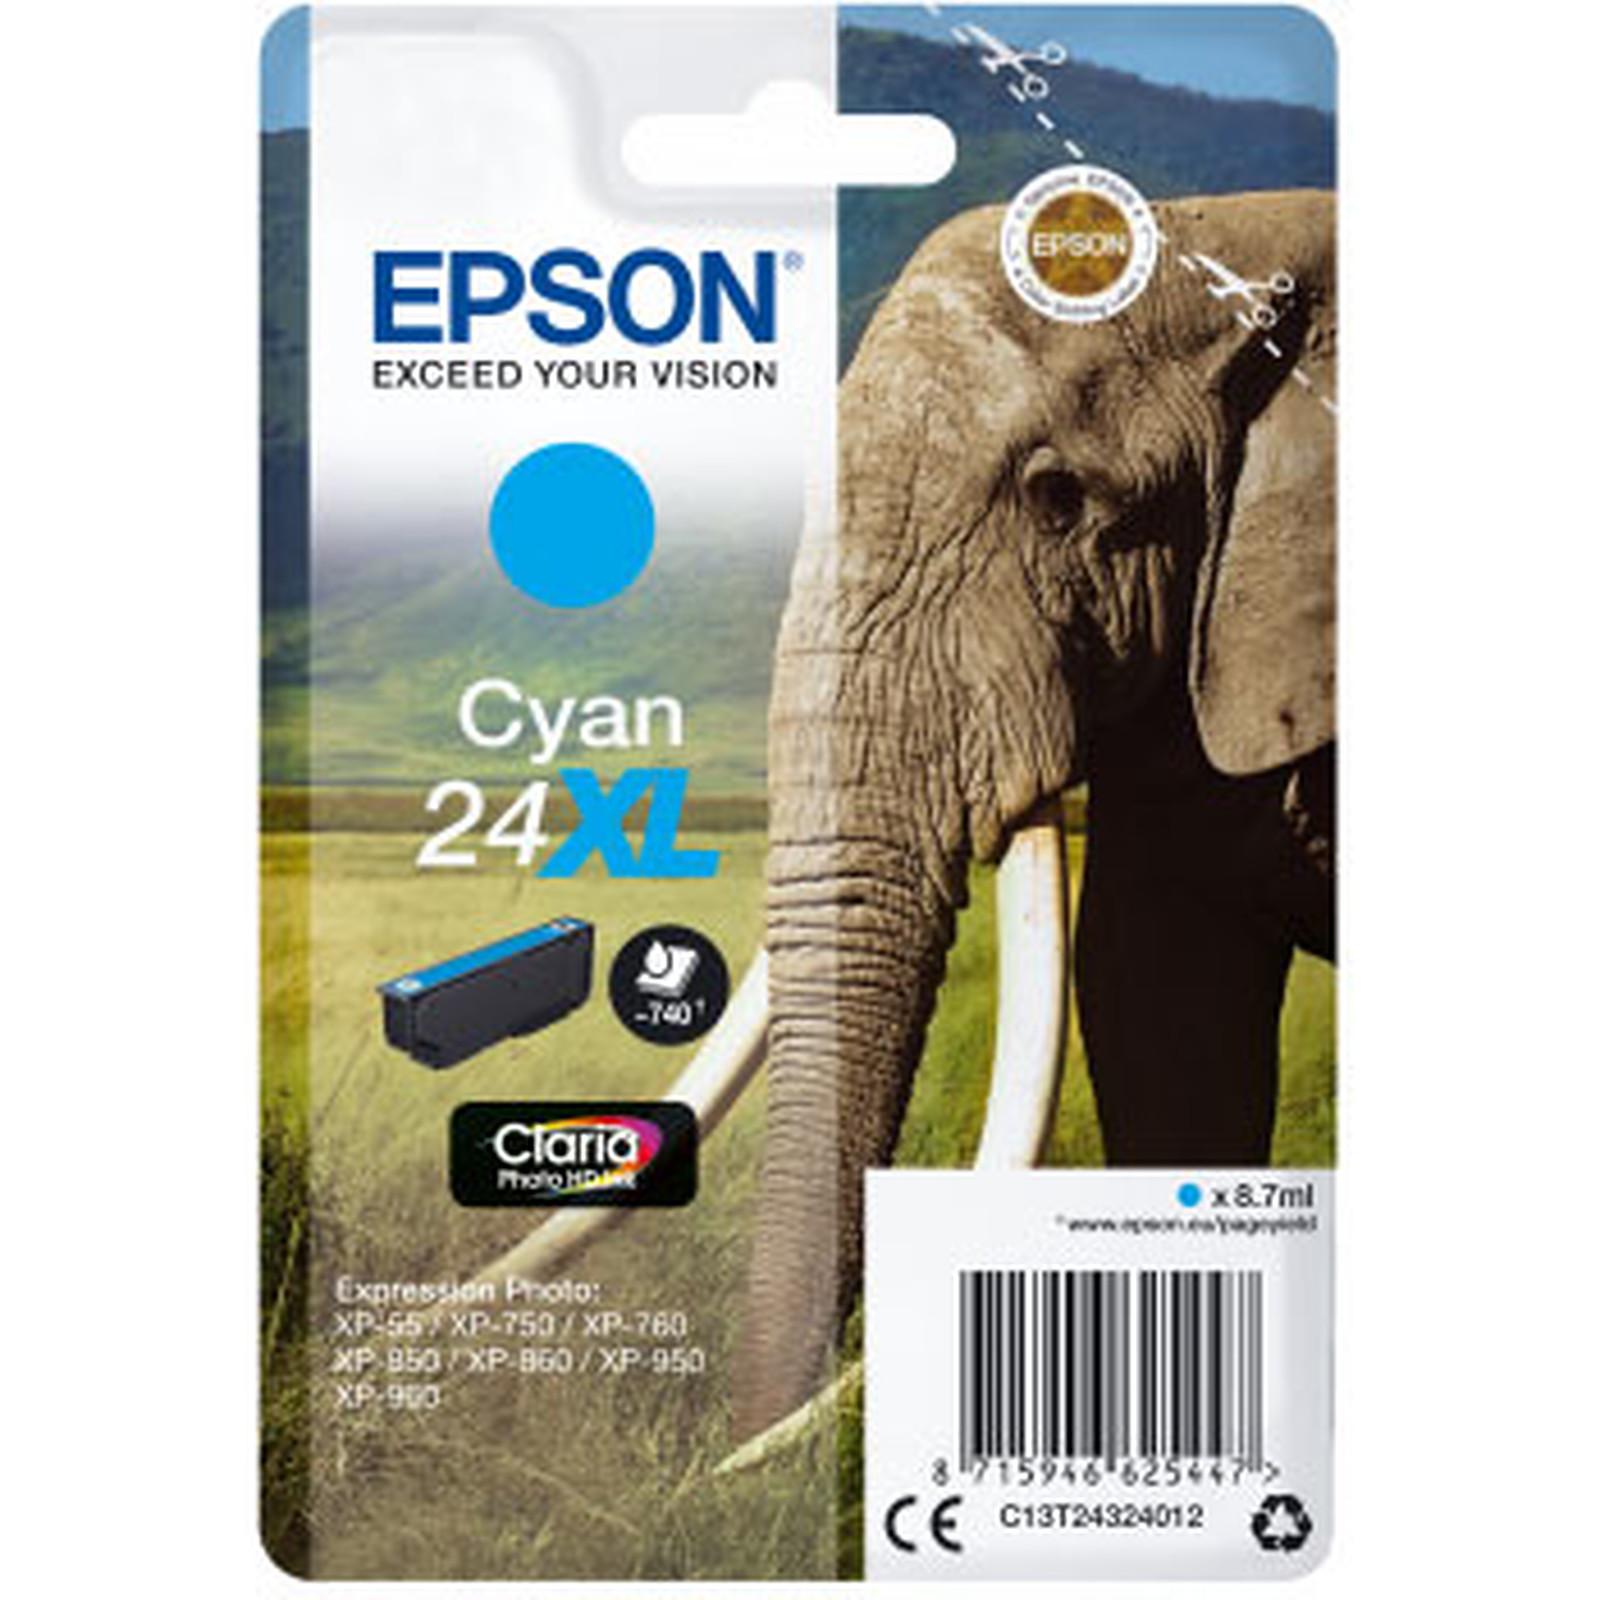 Epson Elephant 24XL Cyan